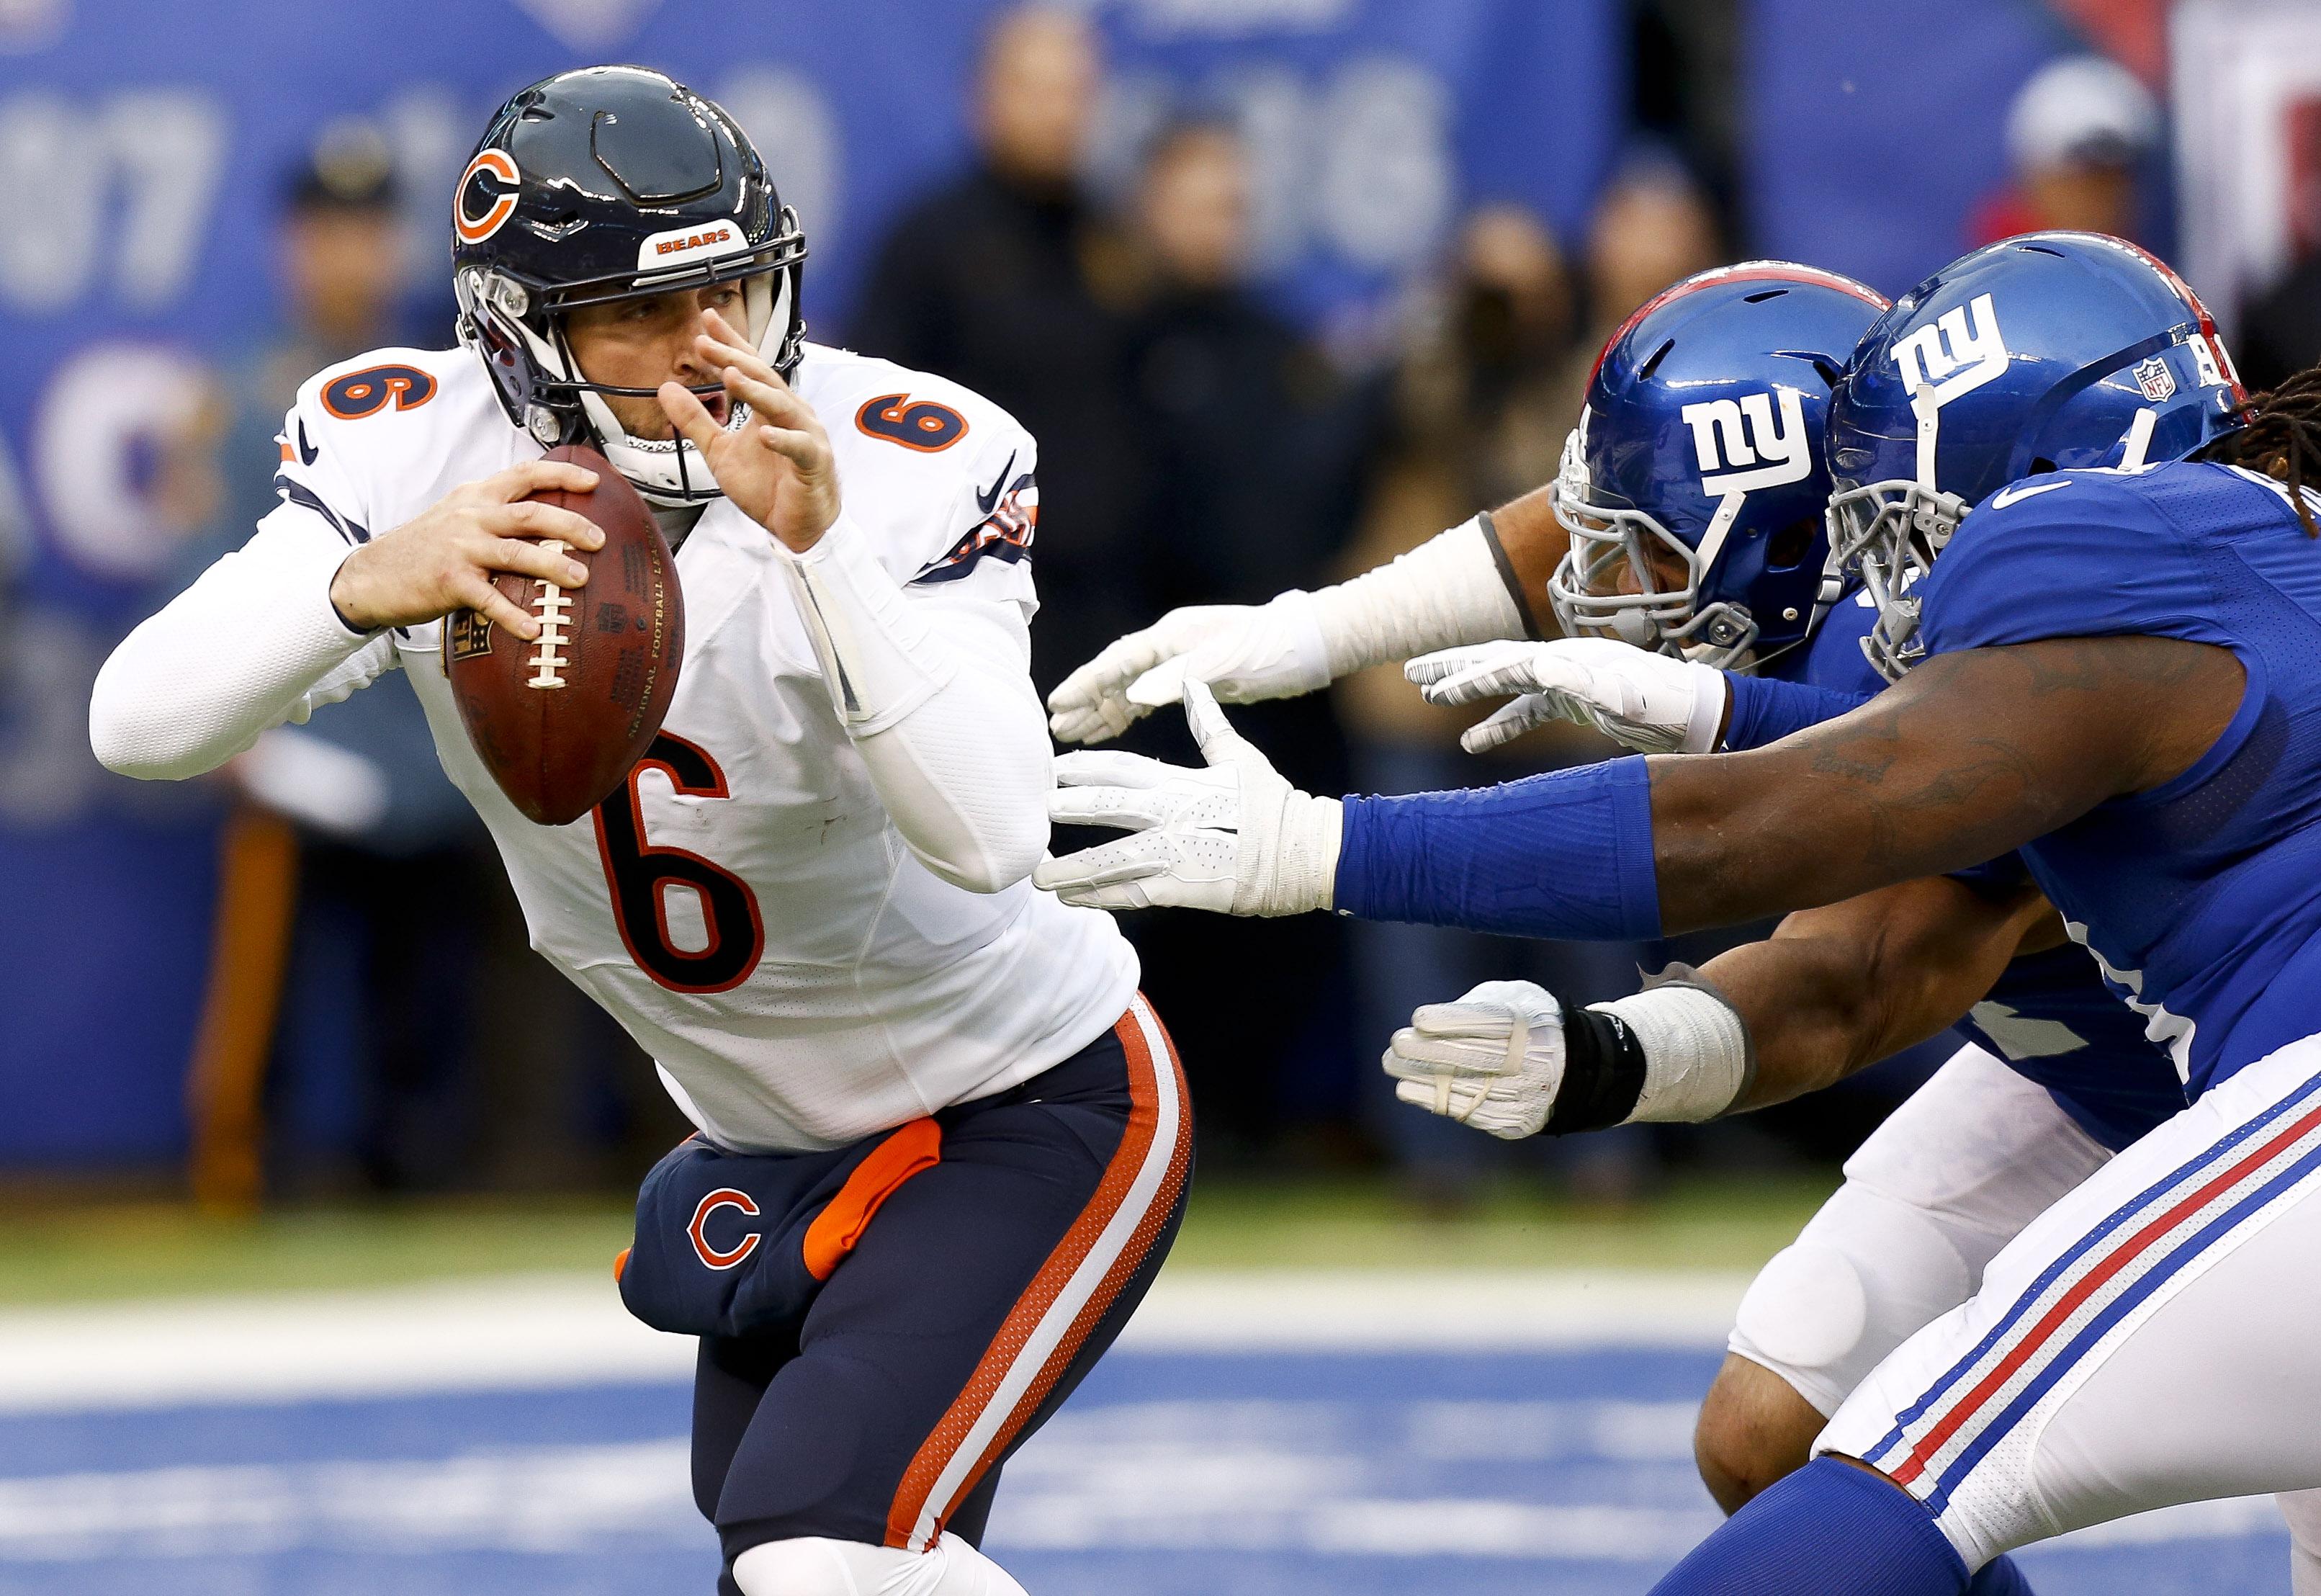 Quarterback Jay Cutler played under Bills offensive coordinator Rick Dennison in Denver. (Getty Images)